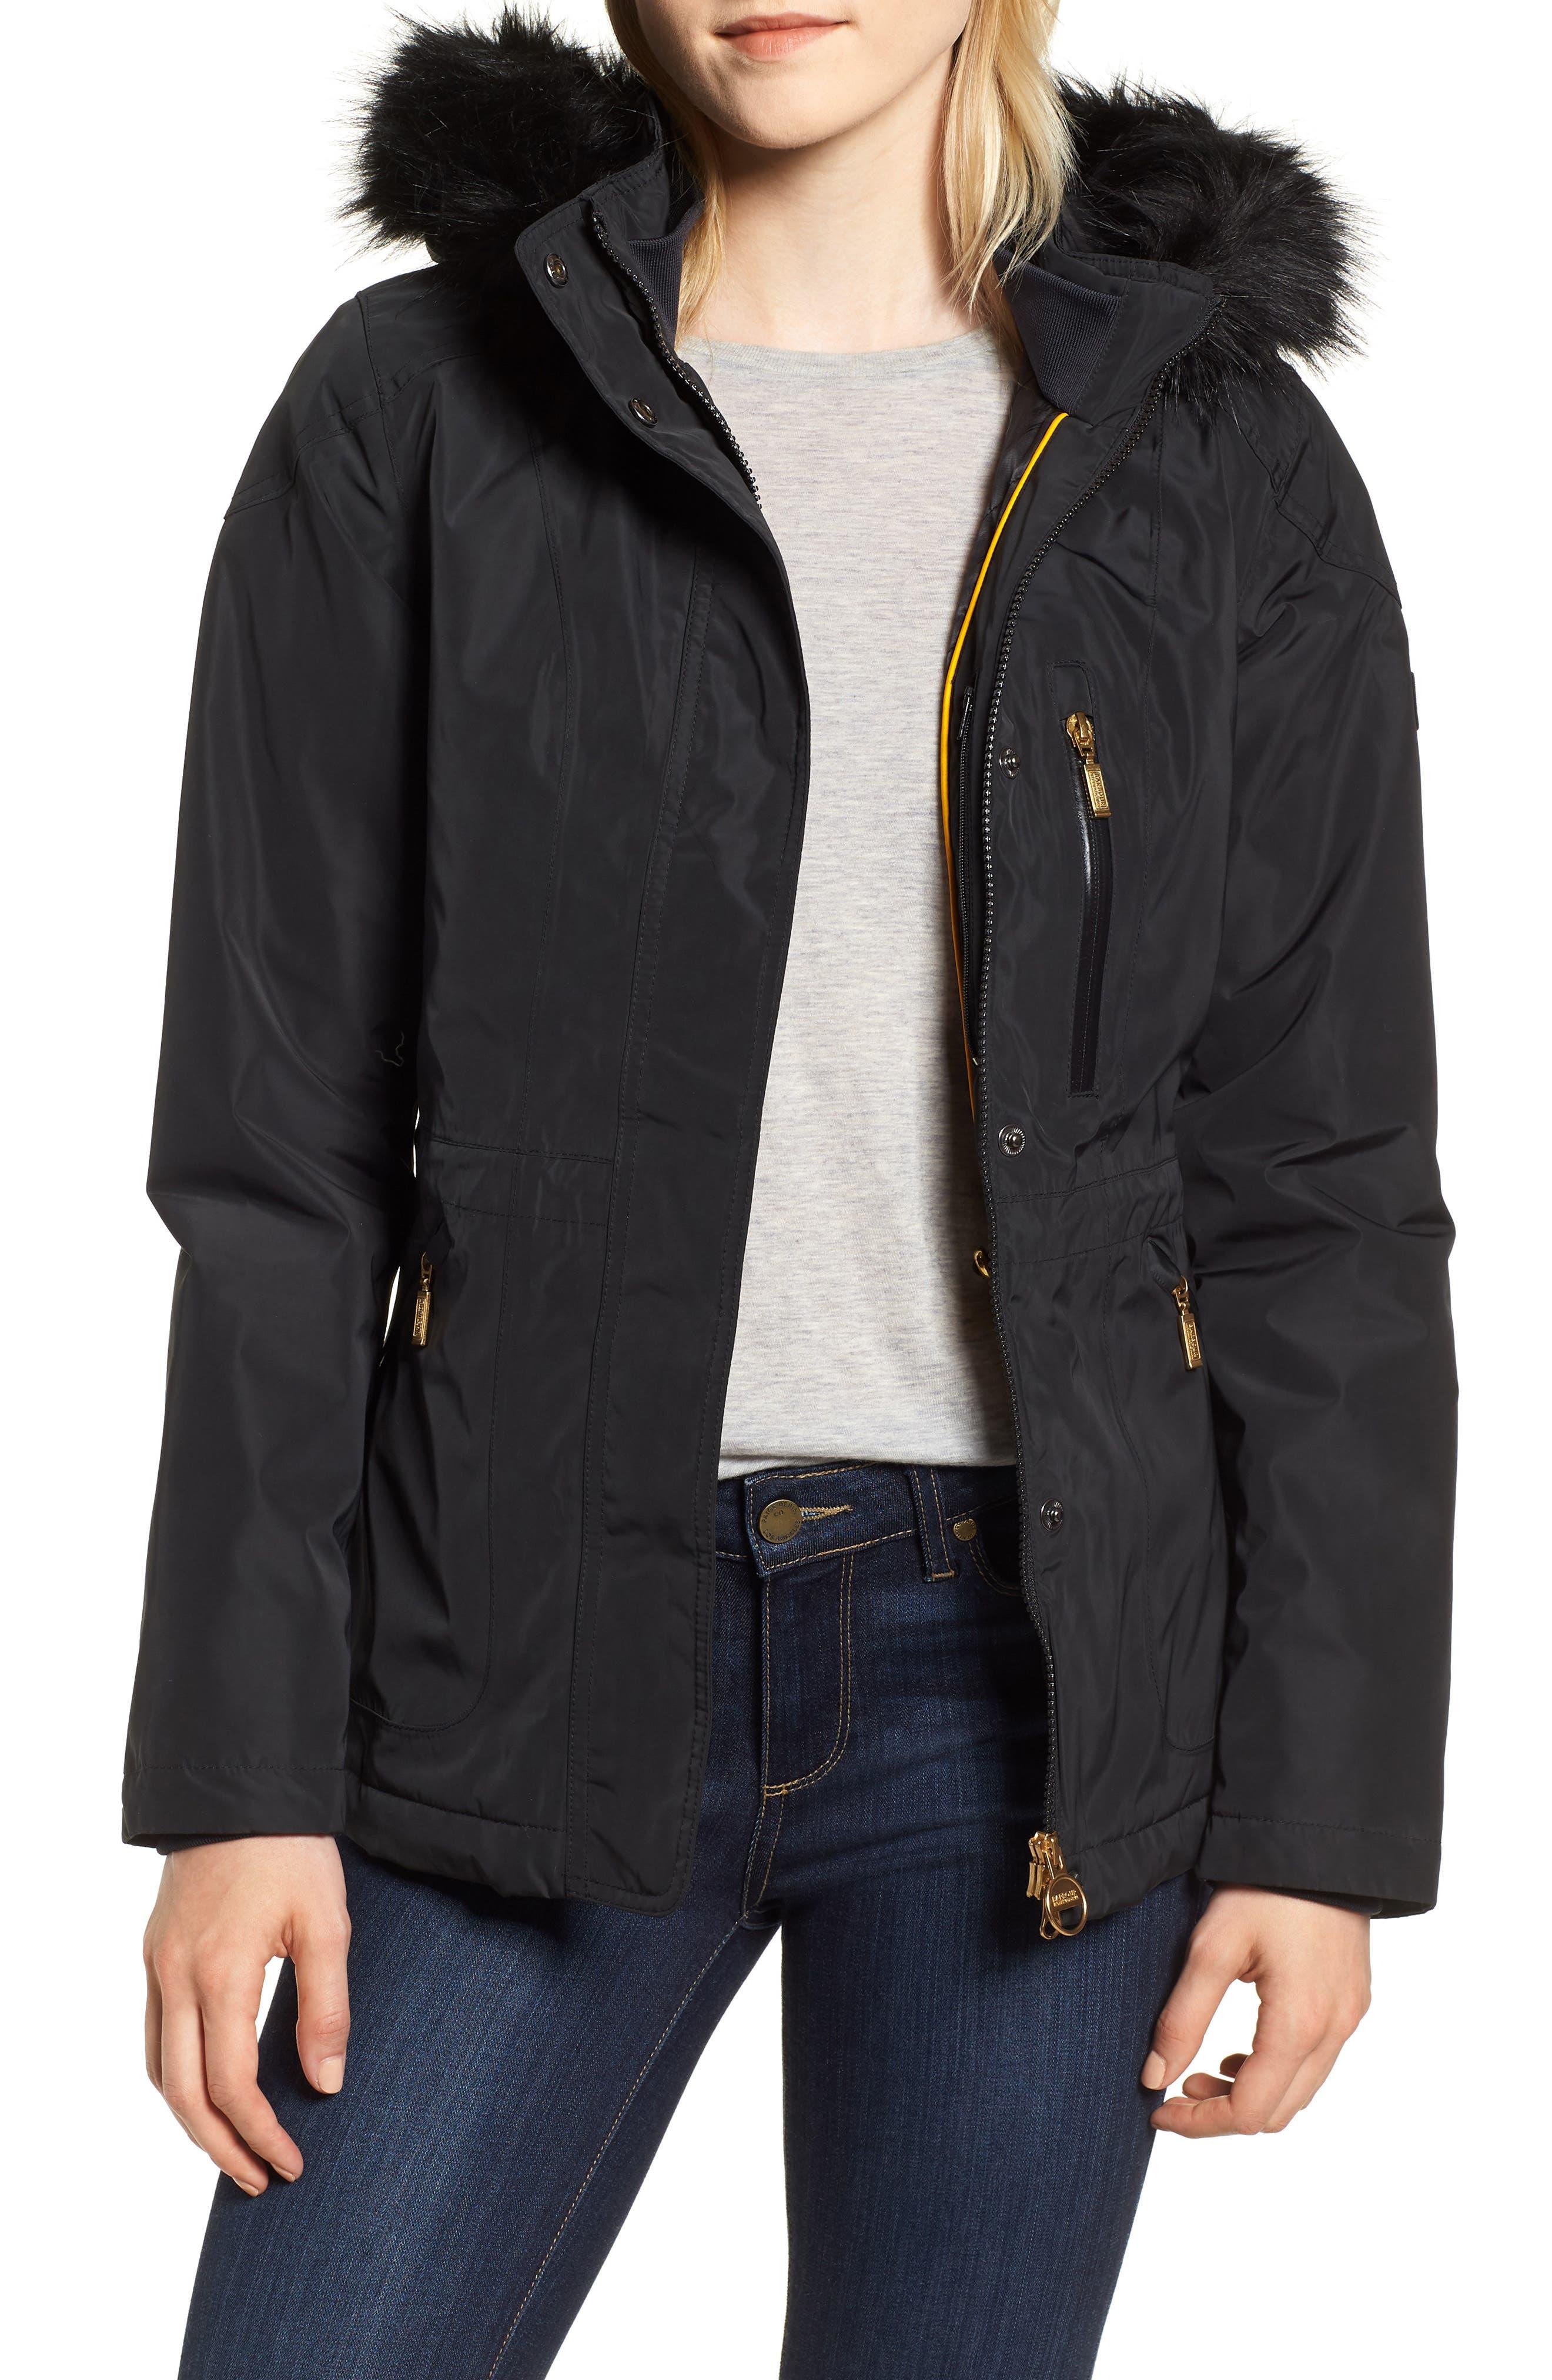 BARBOUR,                             International Aragon Waterproof Breathable Faux Fur Trim Jacket,                             Main thumbnail 1, color,                             001